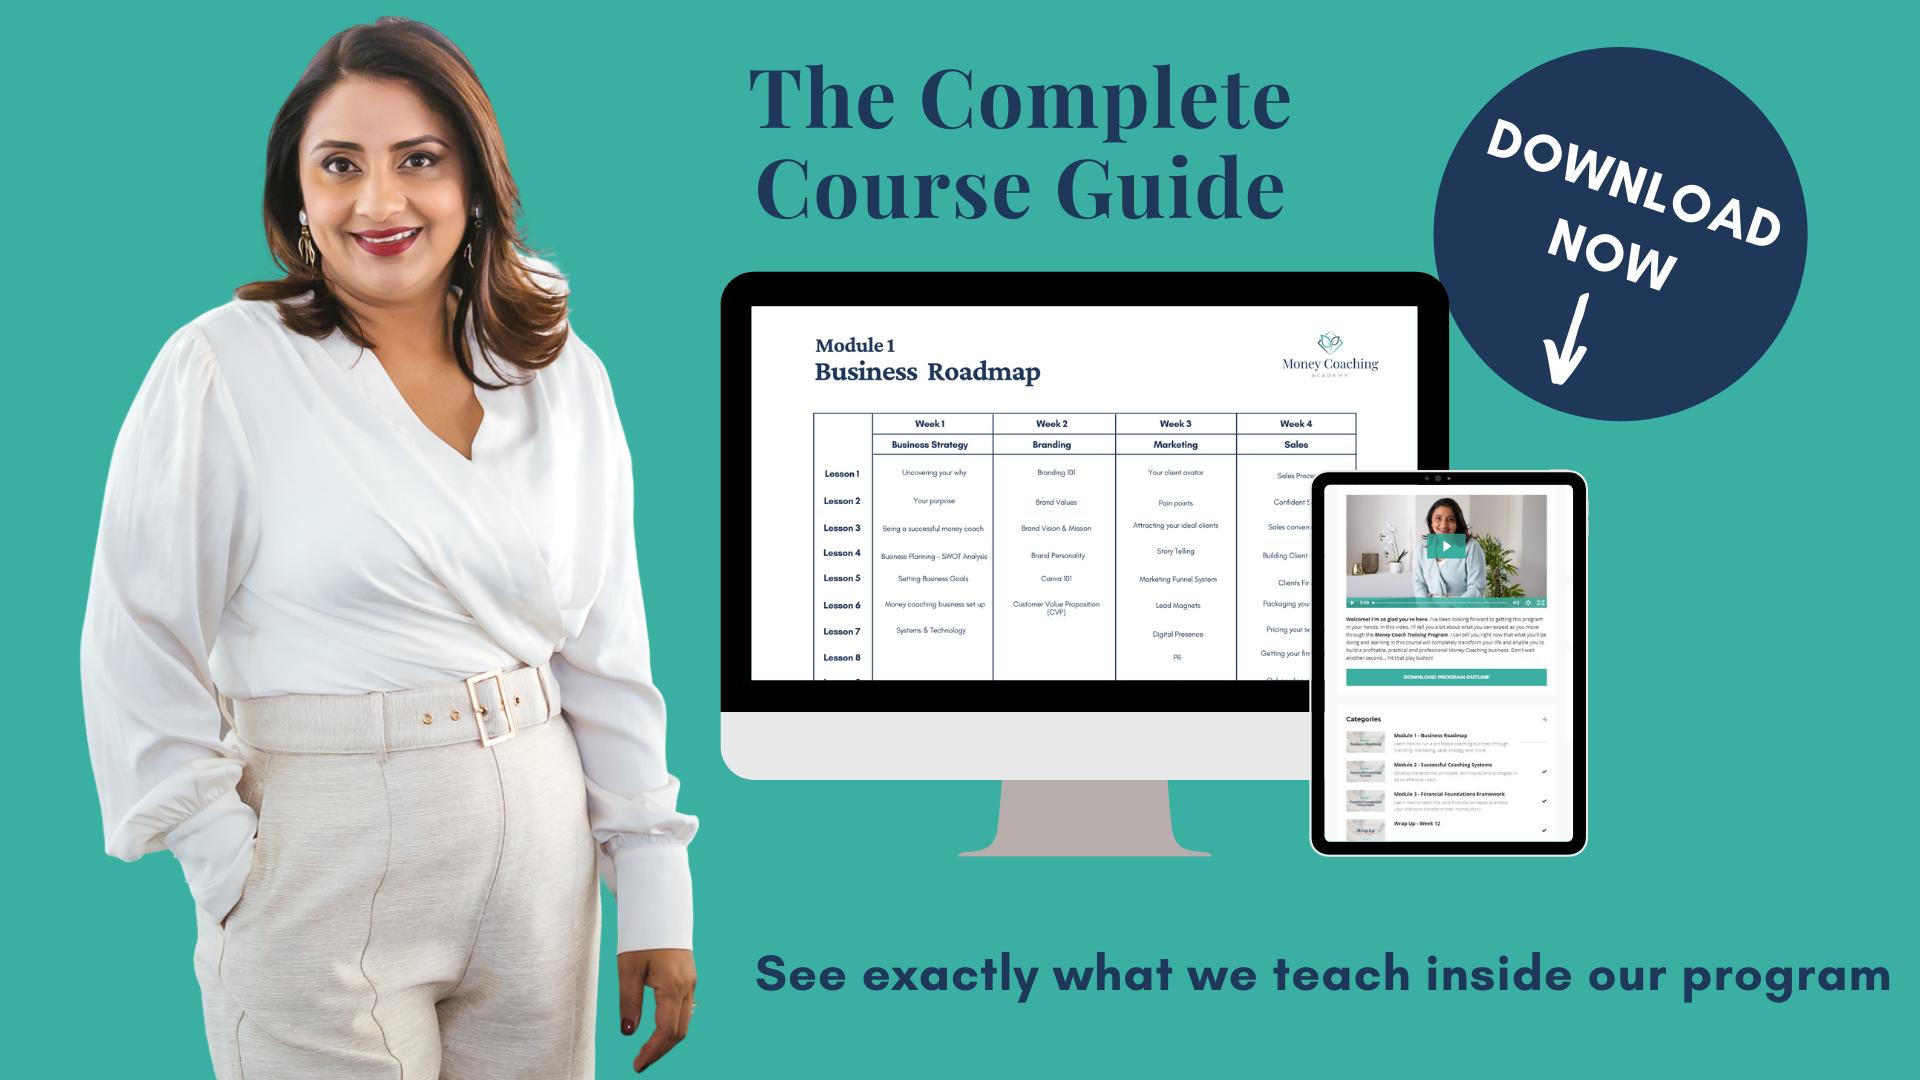 Money Coaching Academy - Program Outline Download